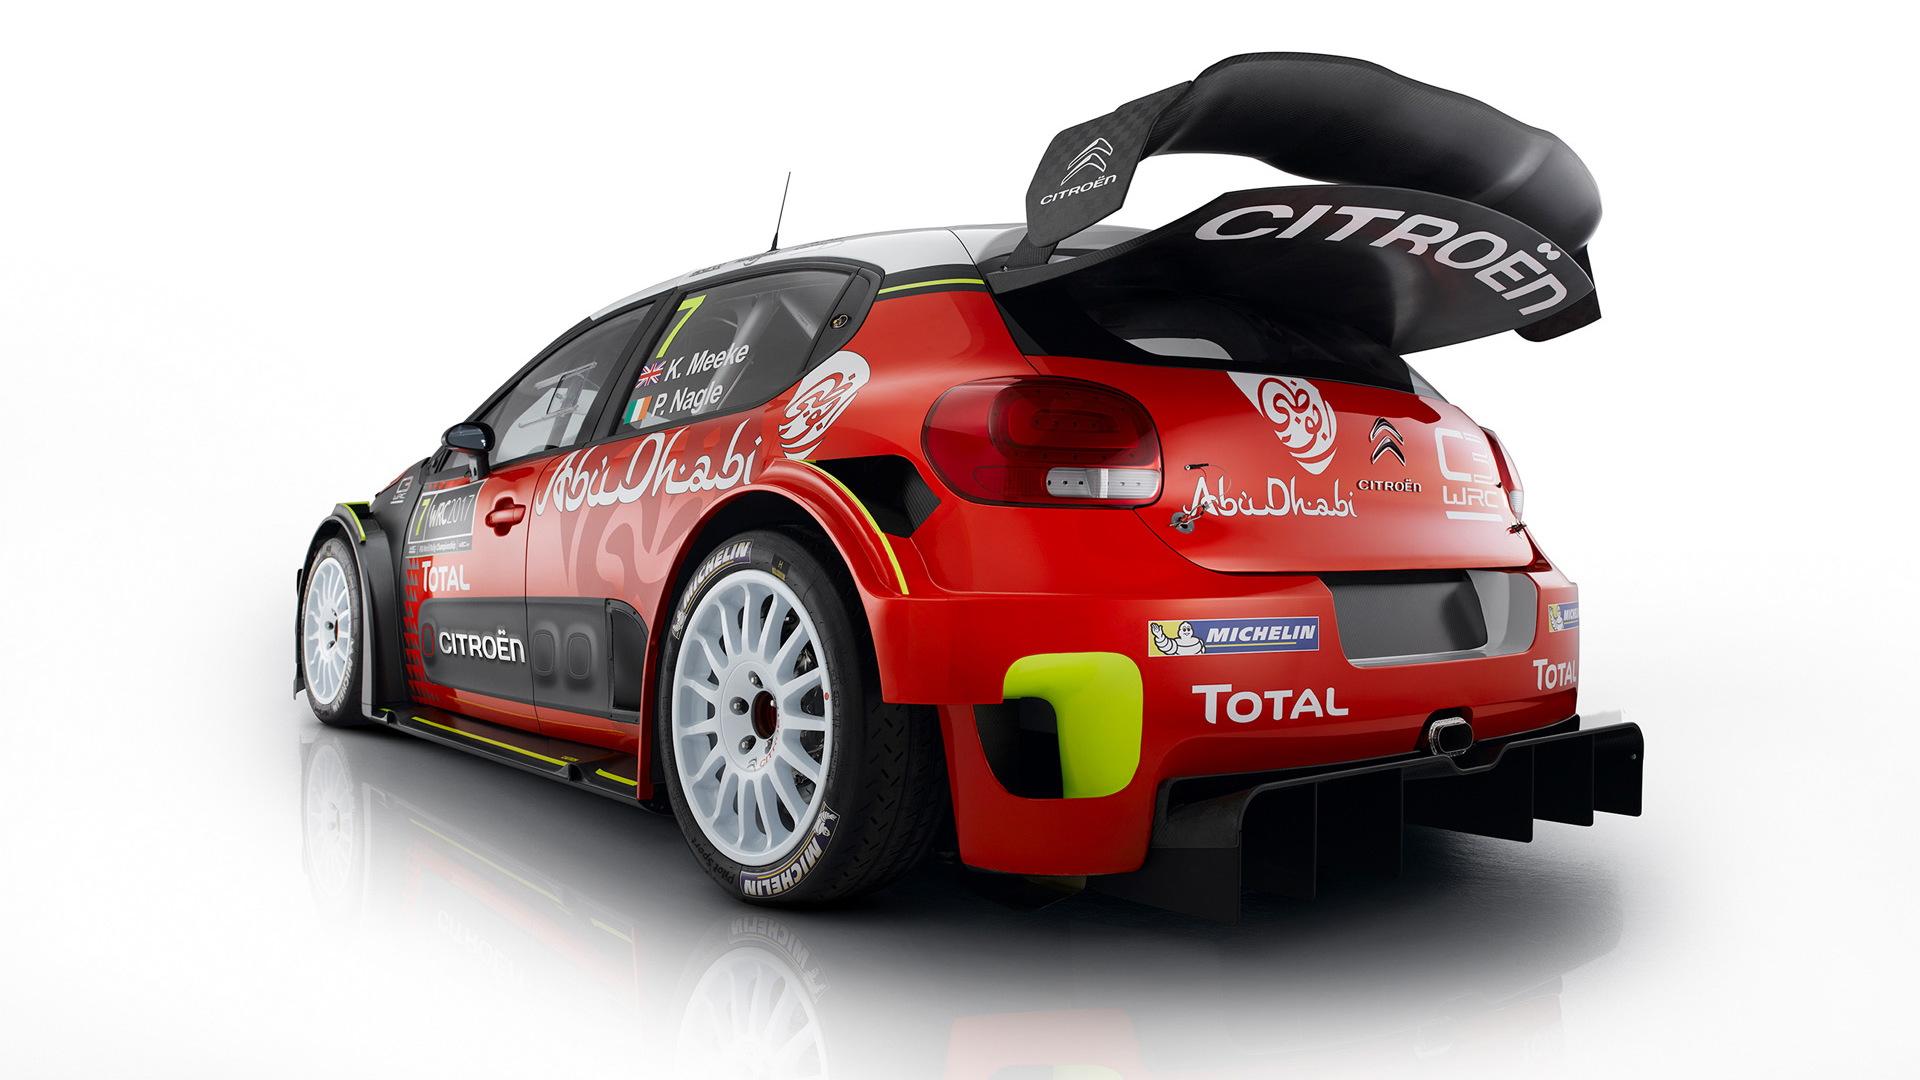 2017 Citroën C3 WRC rally car